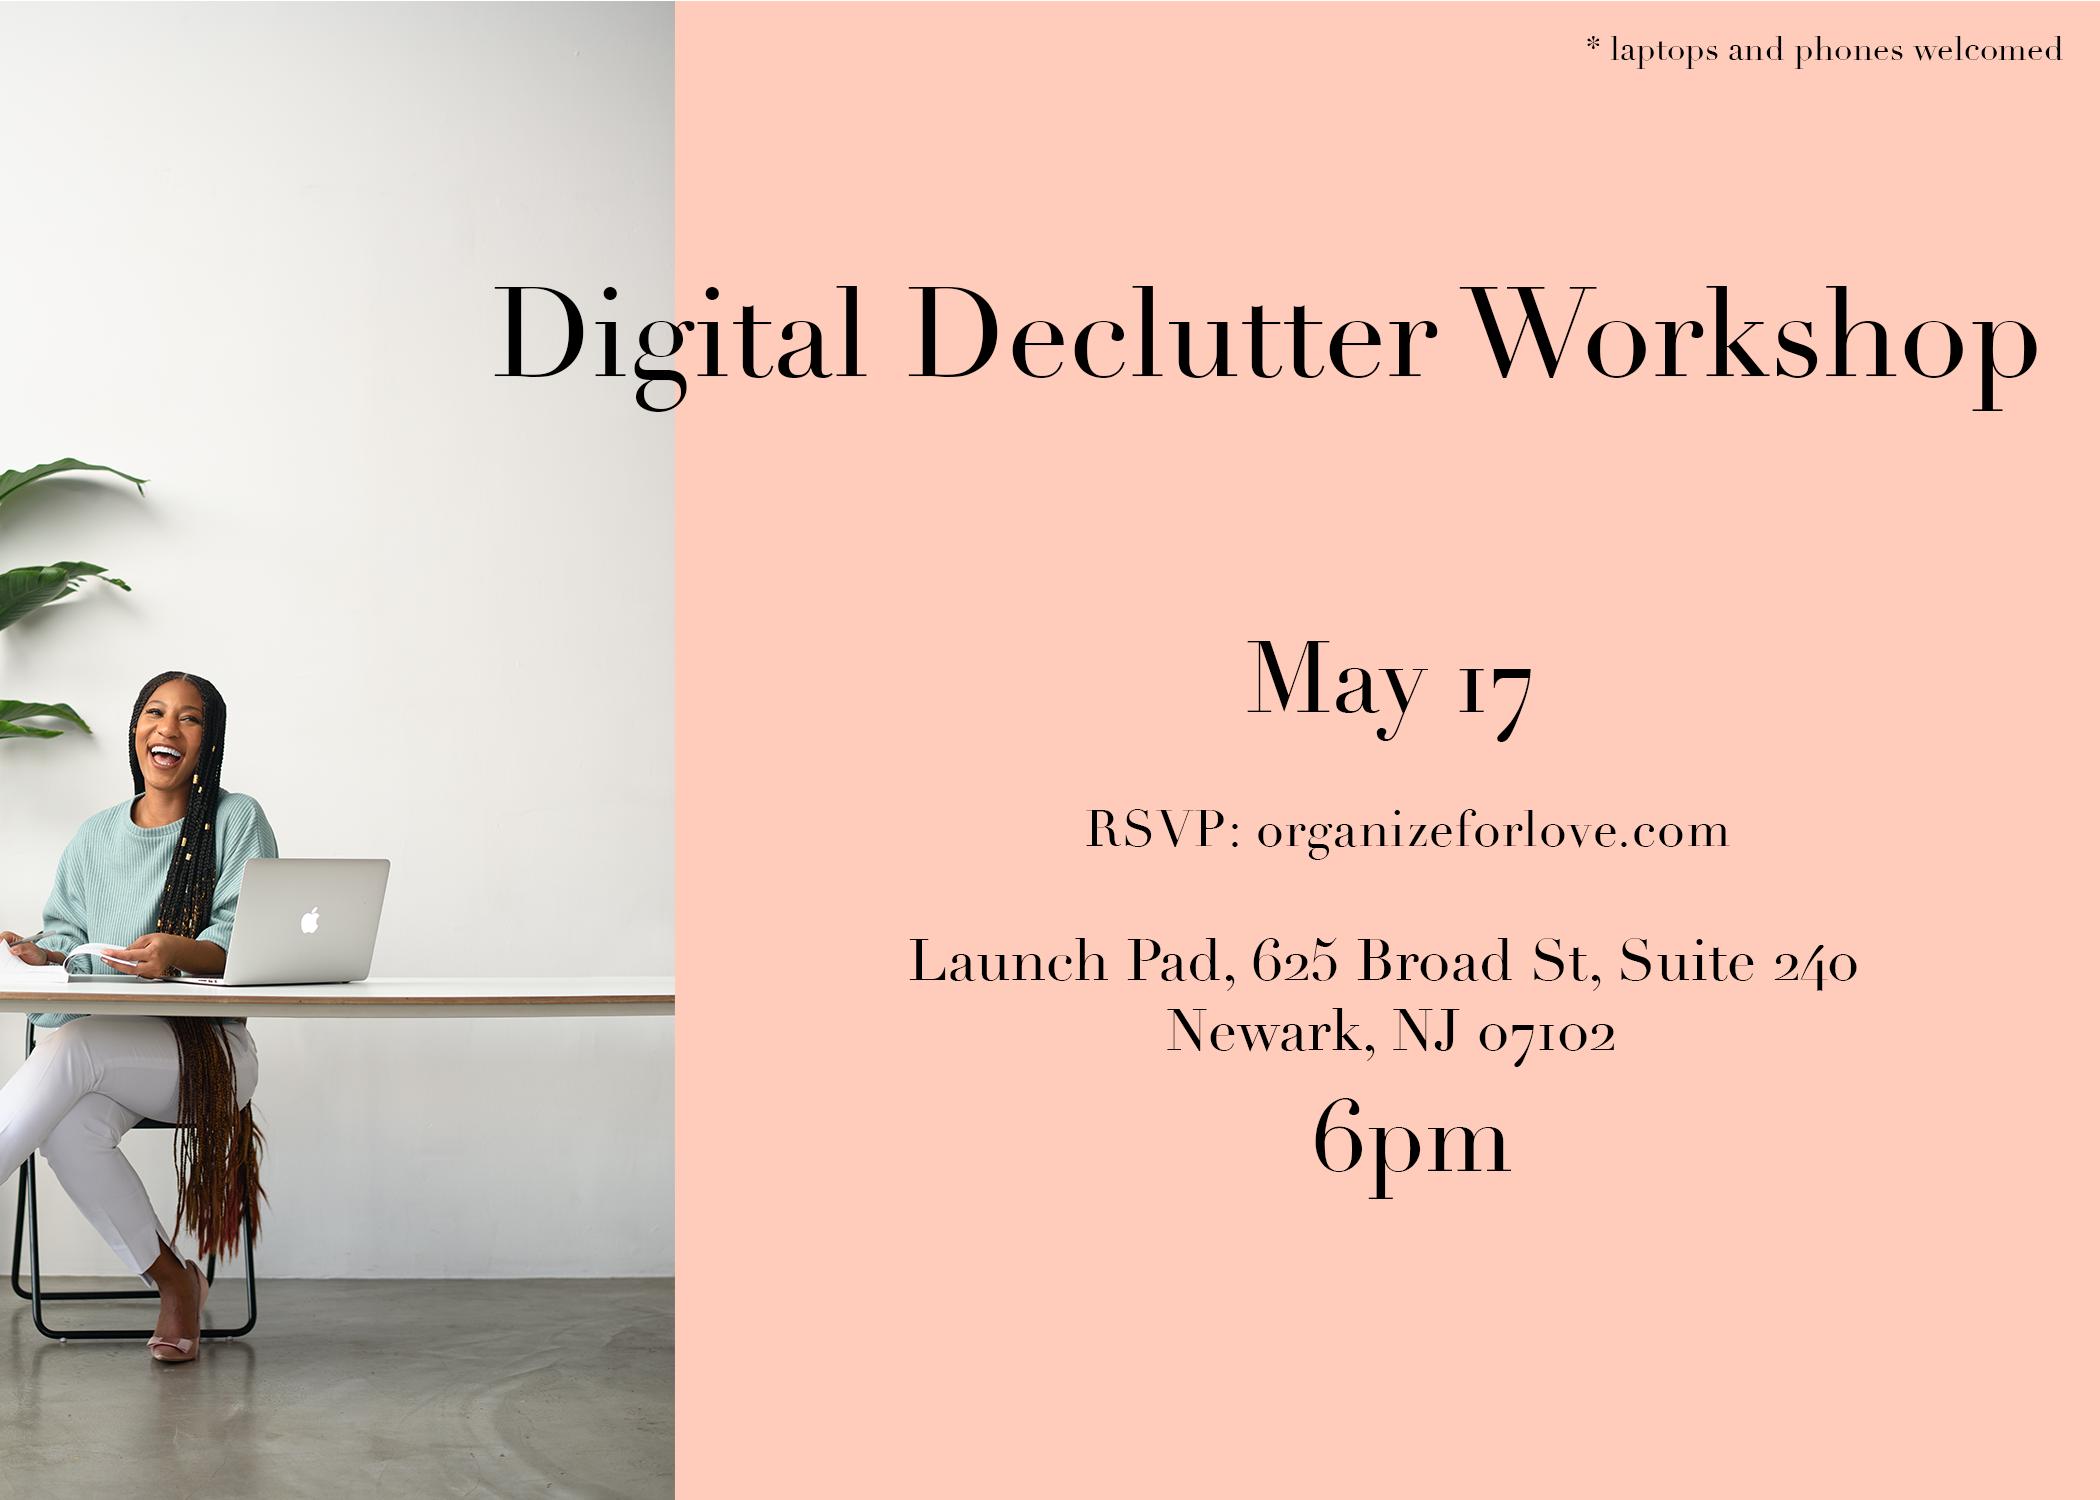 Organize For Love Digital Declutter.png